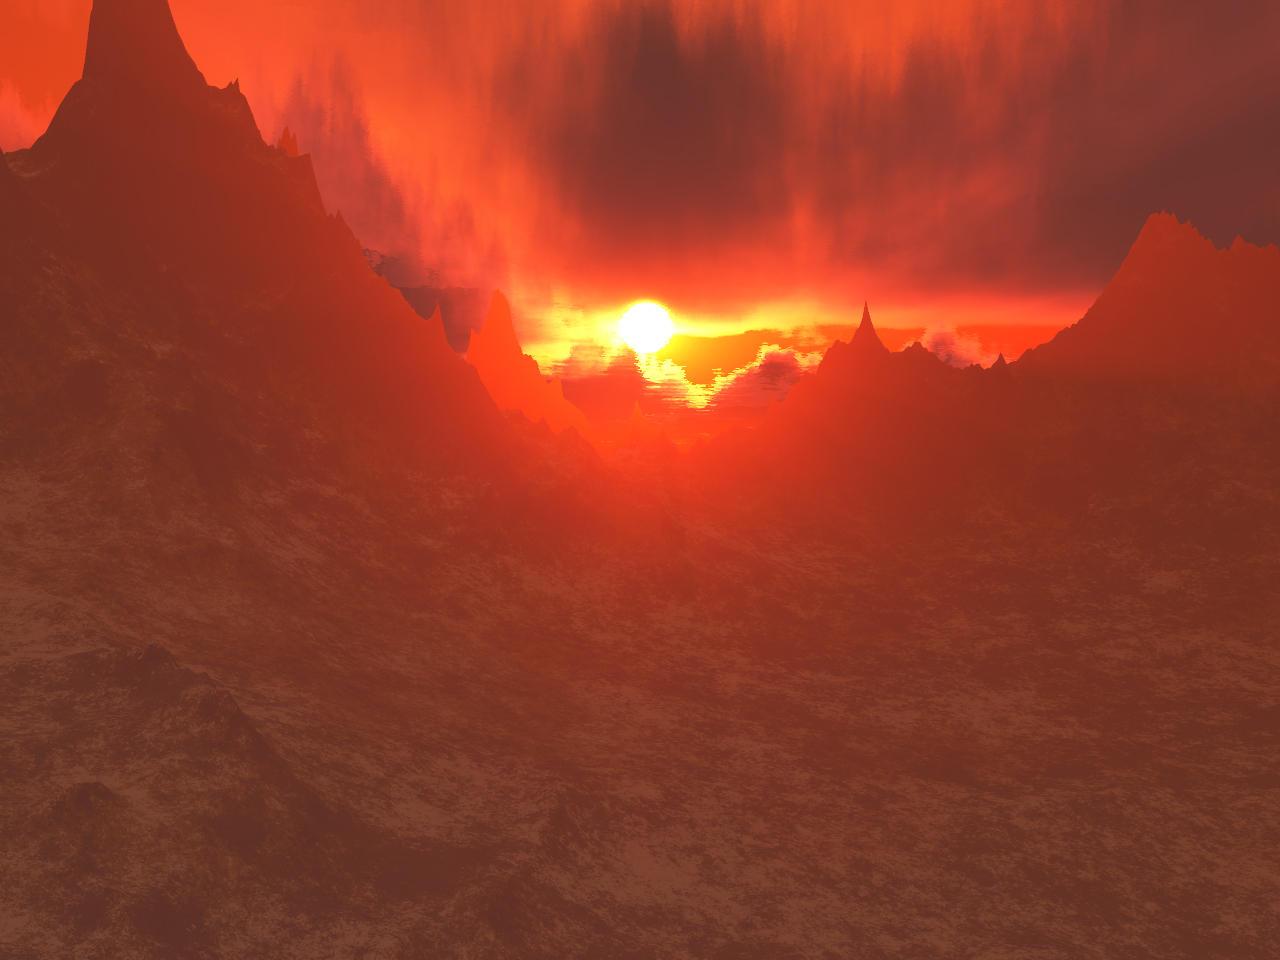 Mars sunset by anubis009 on deviantart - Mars sunset wallpaper ...